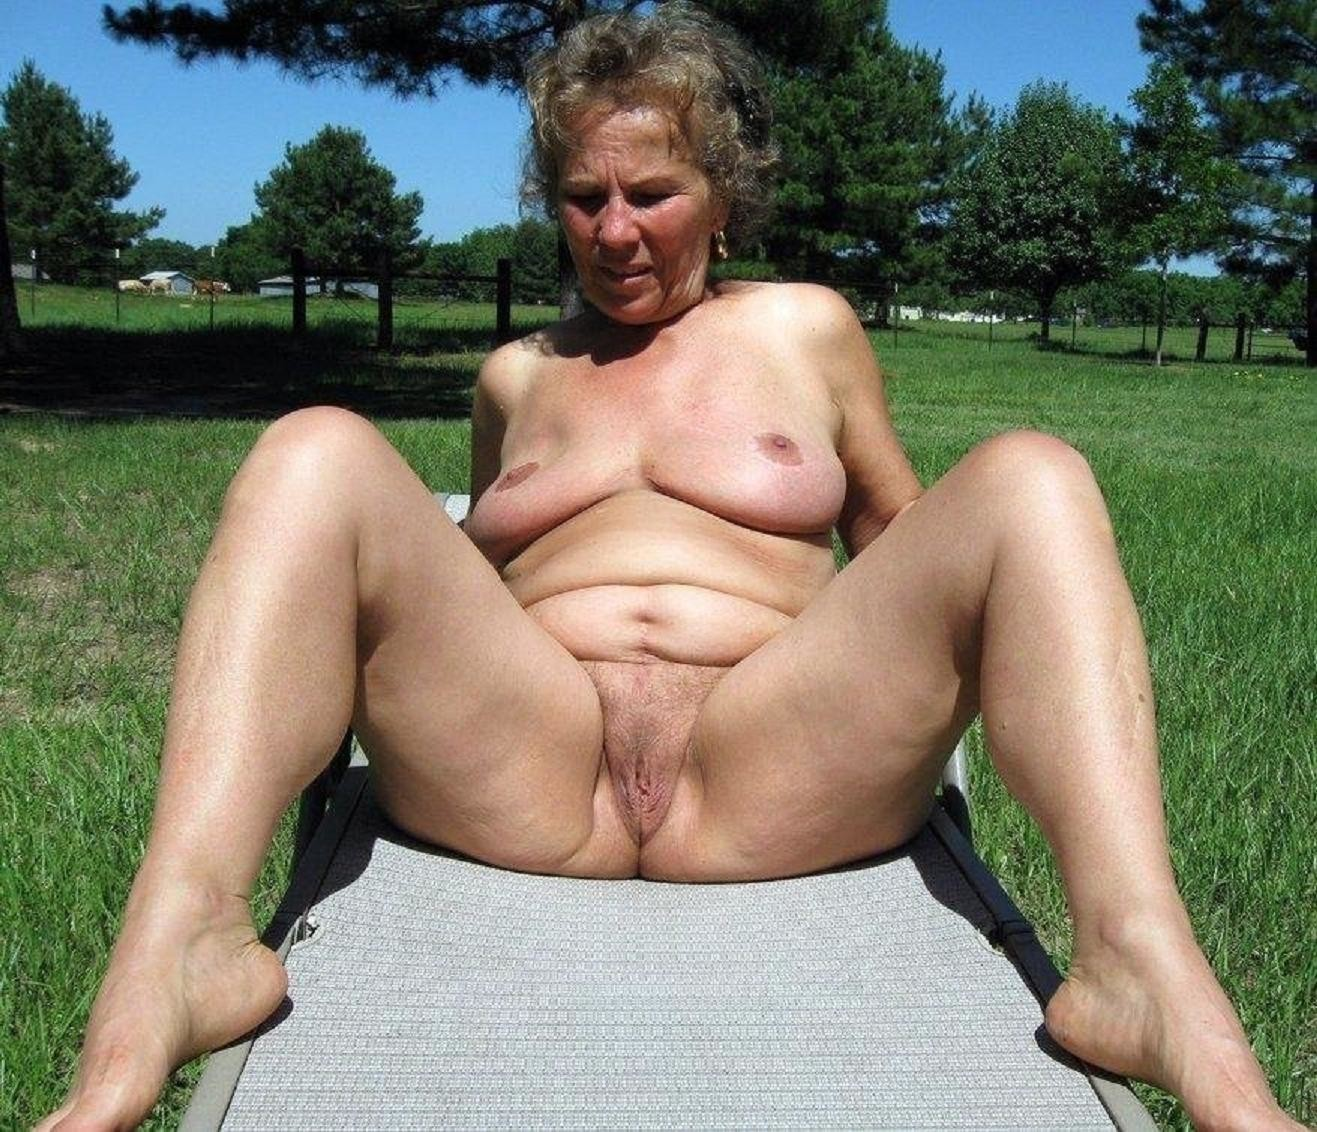 Amateur nude granny pics #14